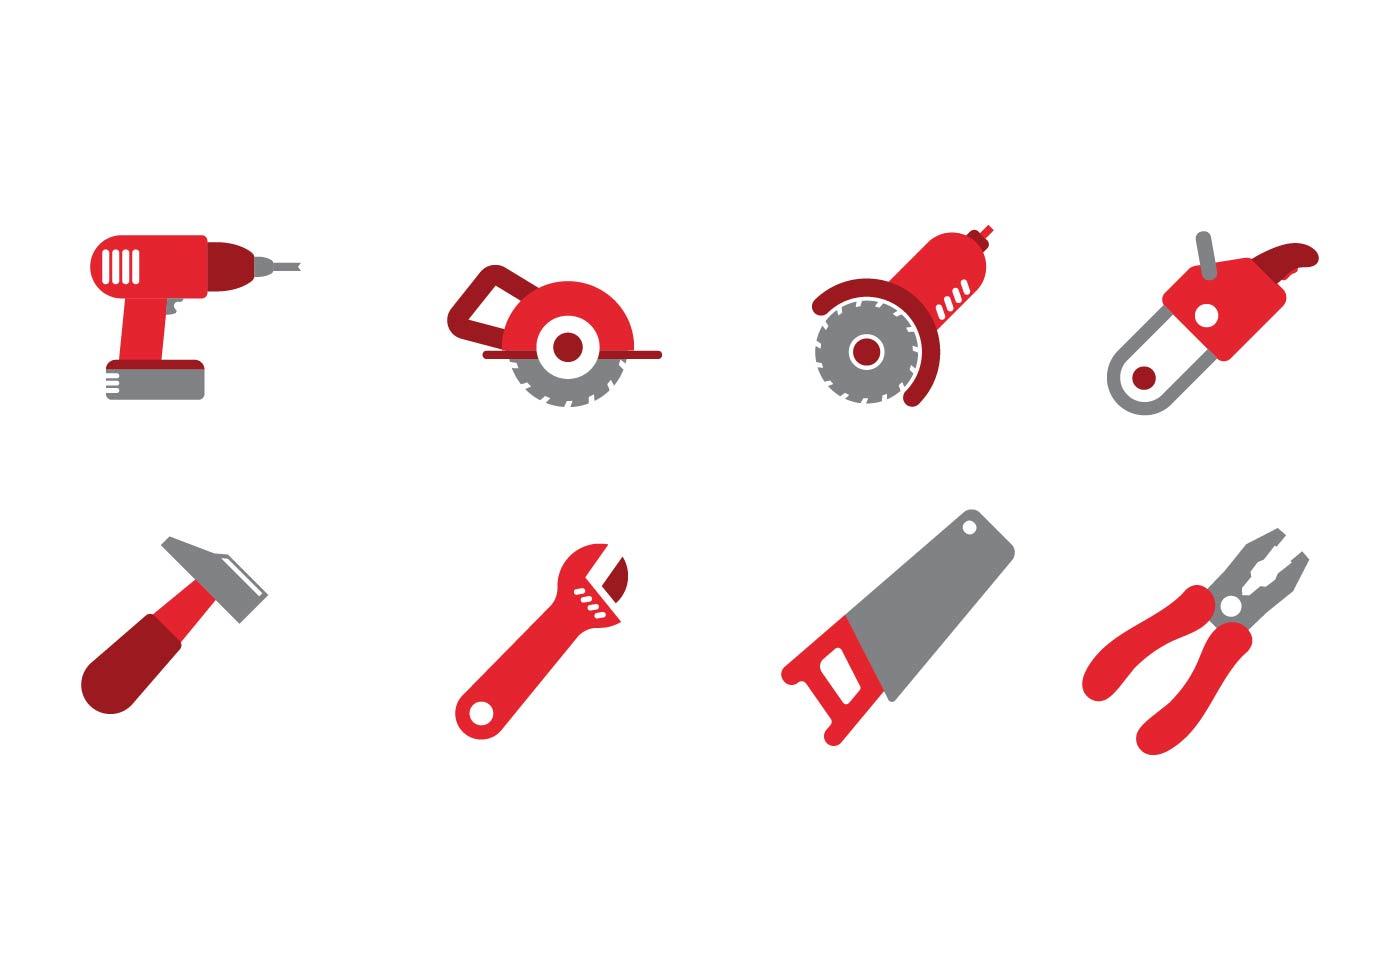 Bricolage vector icon download free vector art stock - Clipart bricolage ...